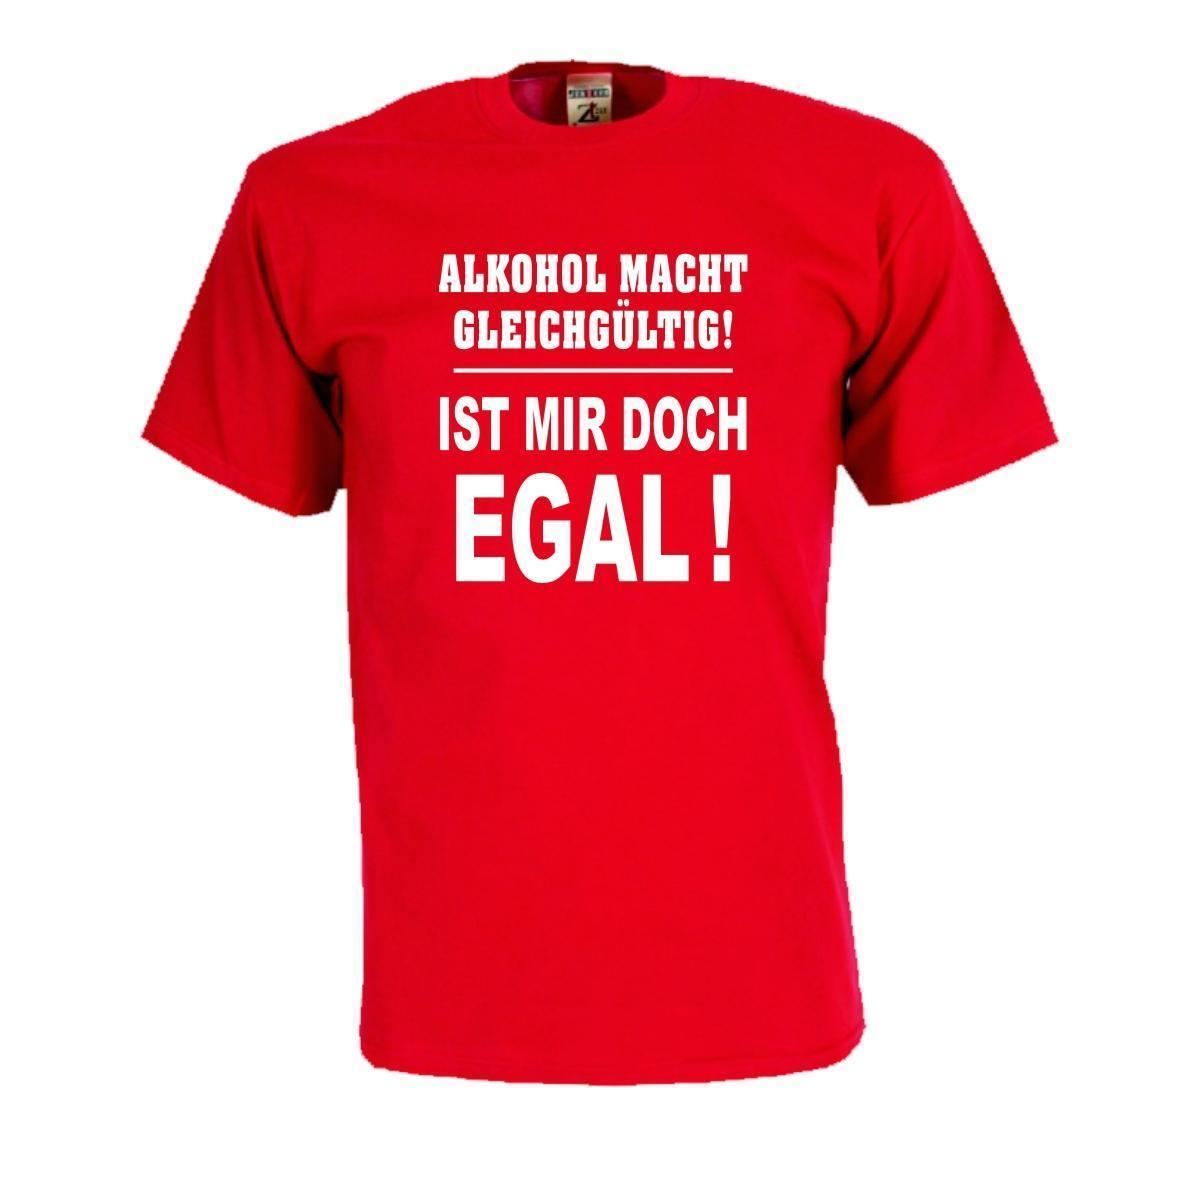 Alkohol Macht Gleichgültig кул Funshirts Lustige Sprüche рубашки Fsb046смешные бесплатная доставка унисекс повседневная футболка